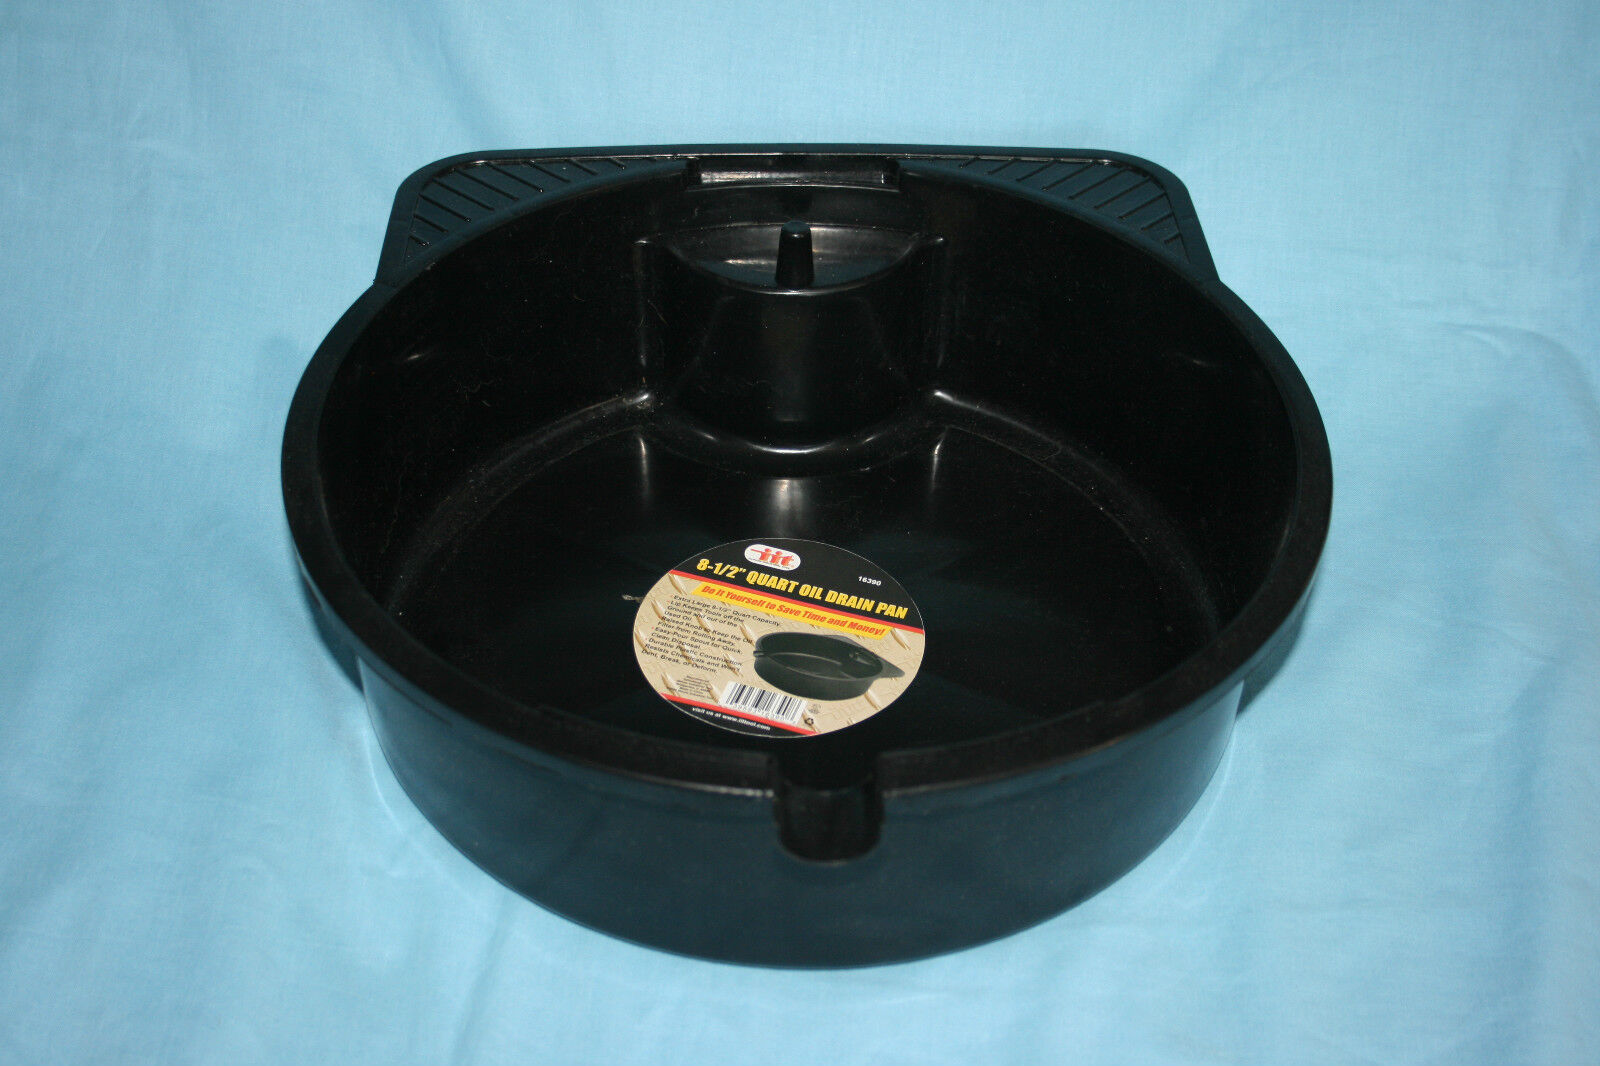 8 5 Quart Oil Drain Pan Spout Plastic Change Your Own Oil Save Money Black New For Sale In